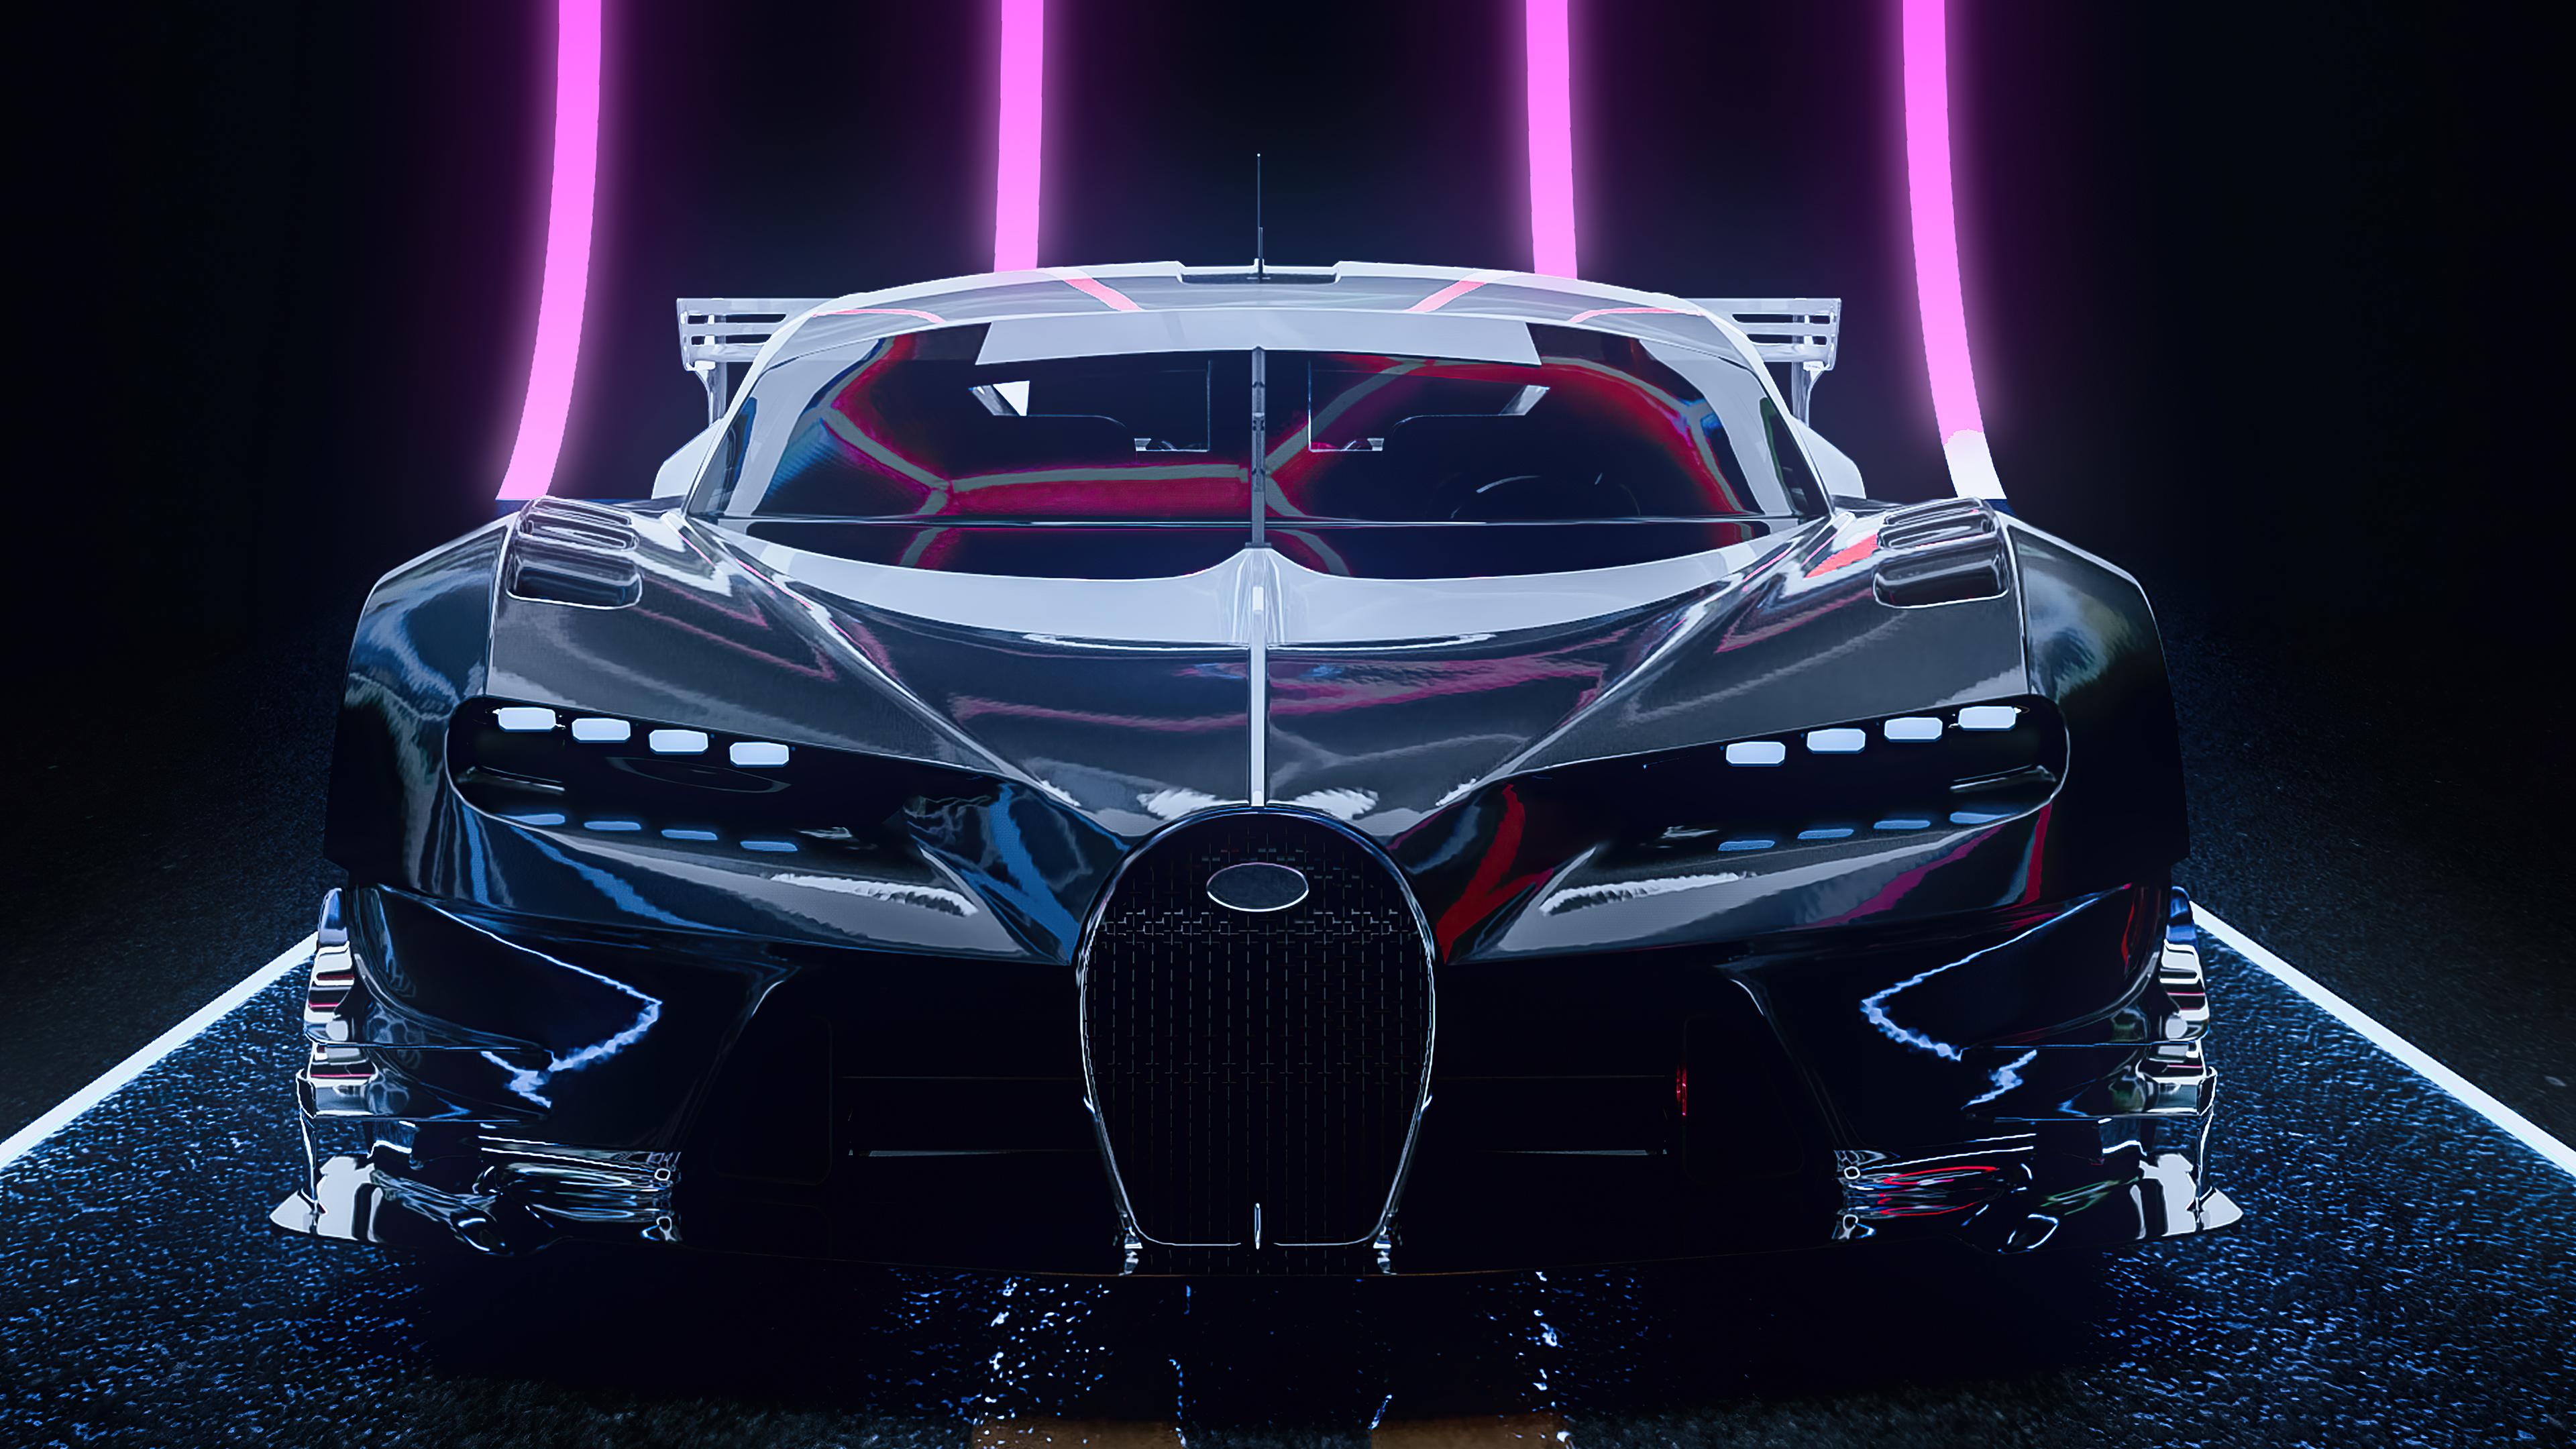 bugatti chiron cgi artwork 4k 1618920195 - Bugatti Chiron Cgi Artwork 4k - Bugatti Chiron Cgi Artwork 4k wallpapers